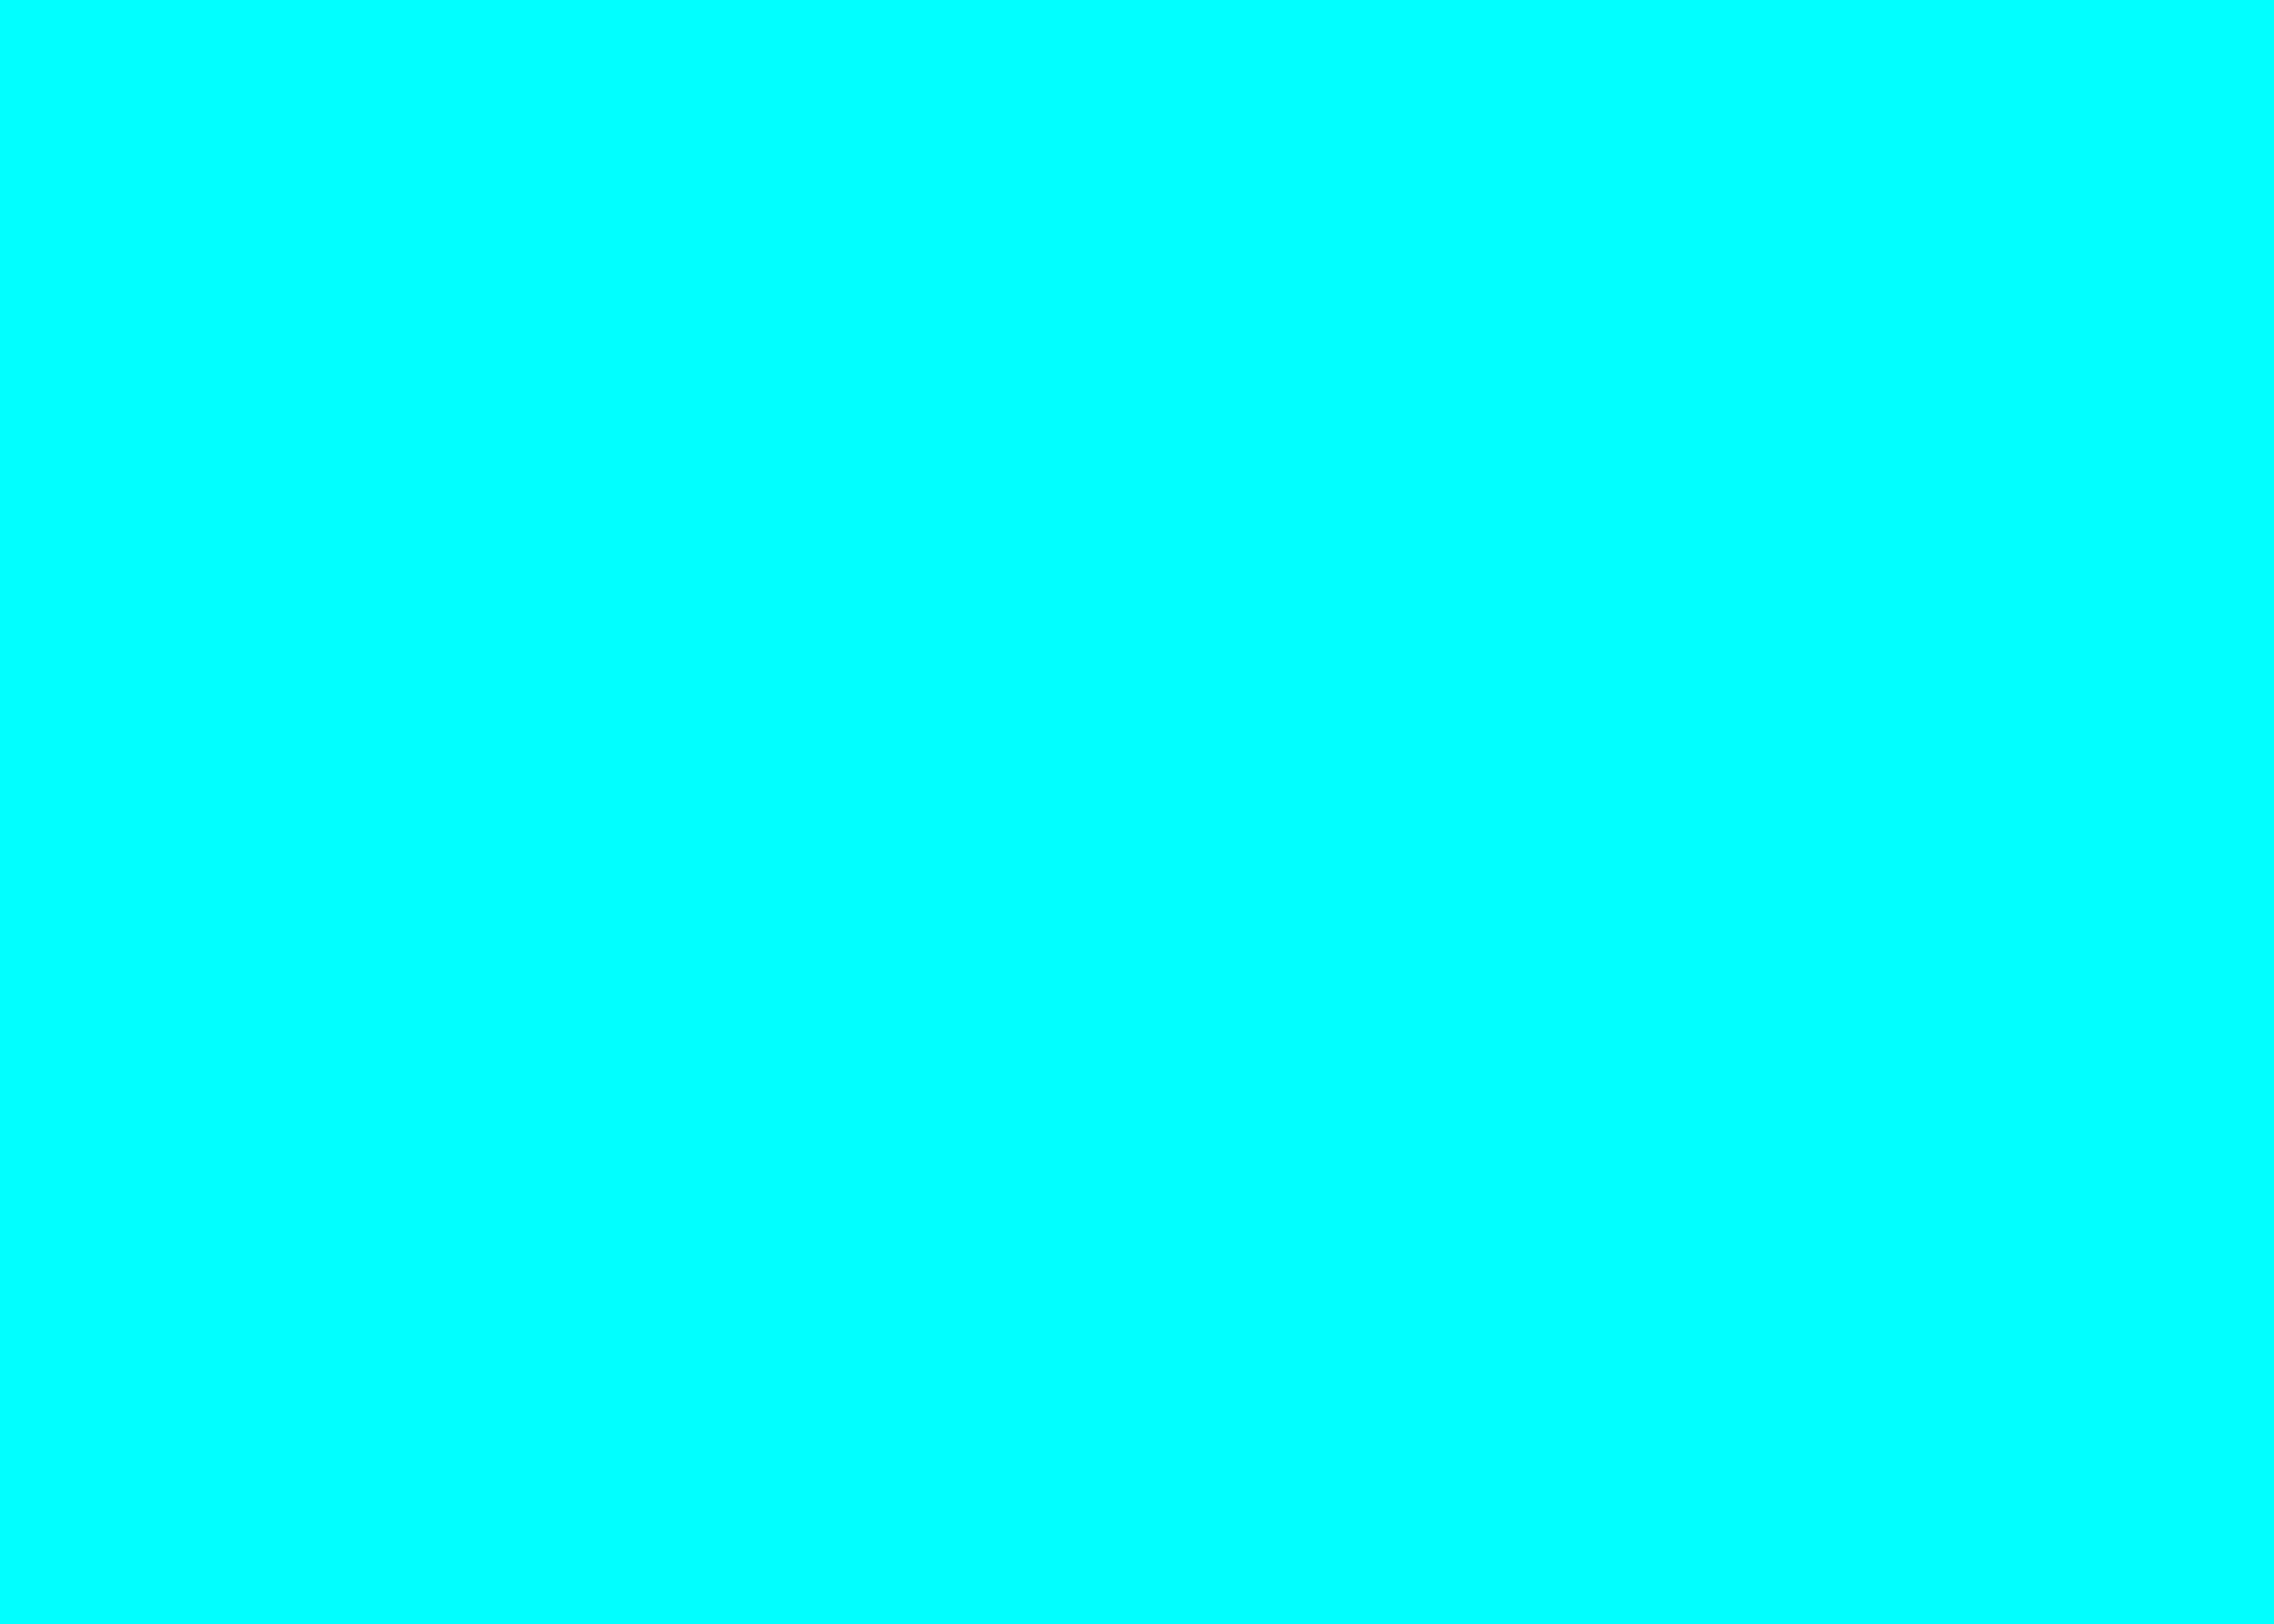 aqua color coordinates hex triplet 00ffff srgbb r g b 0 255 255 source html css the. Black Bedroom Furniture Sets. Home Design Ideas